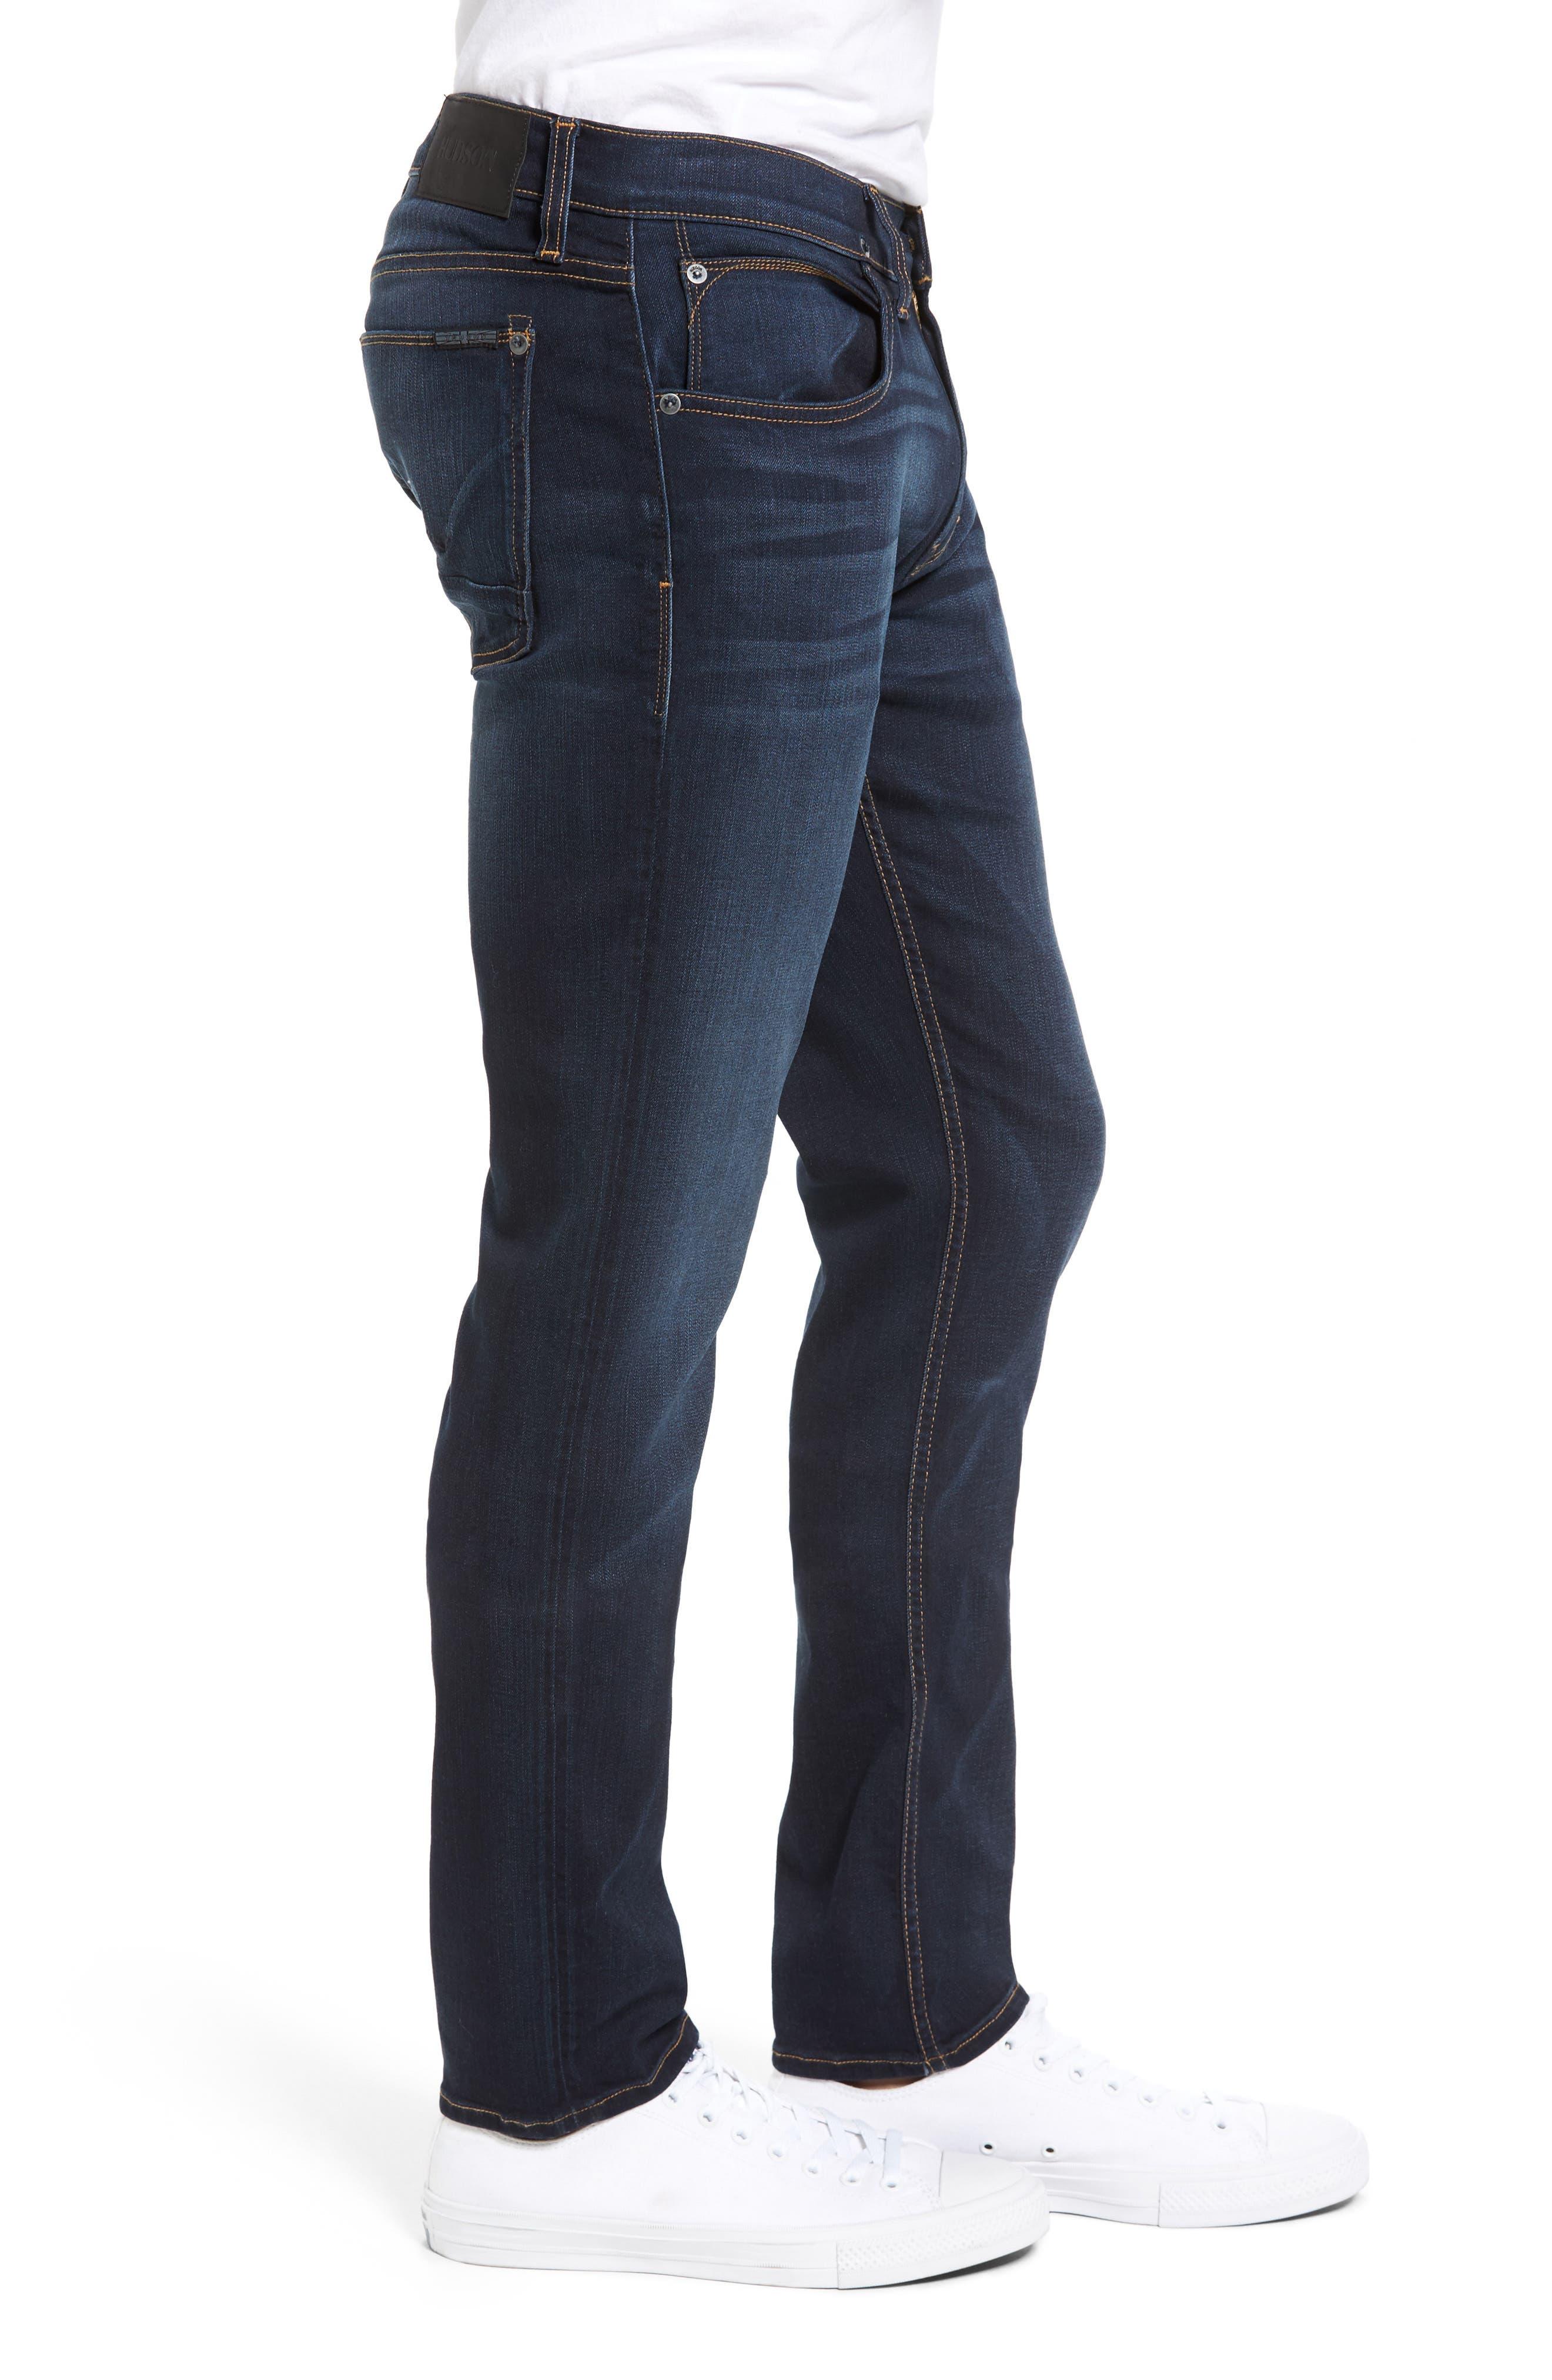 Blake Slim Fit Jeans,                             Alternate thumbnail 9, color,